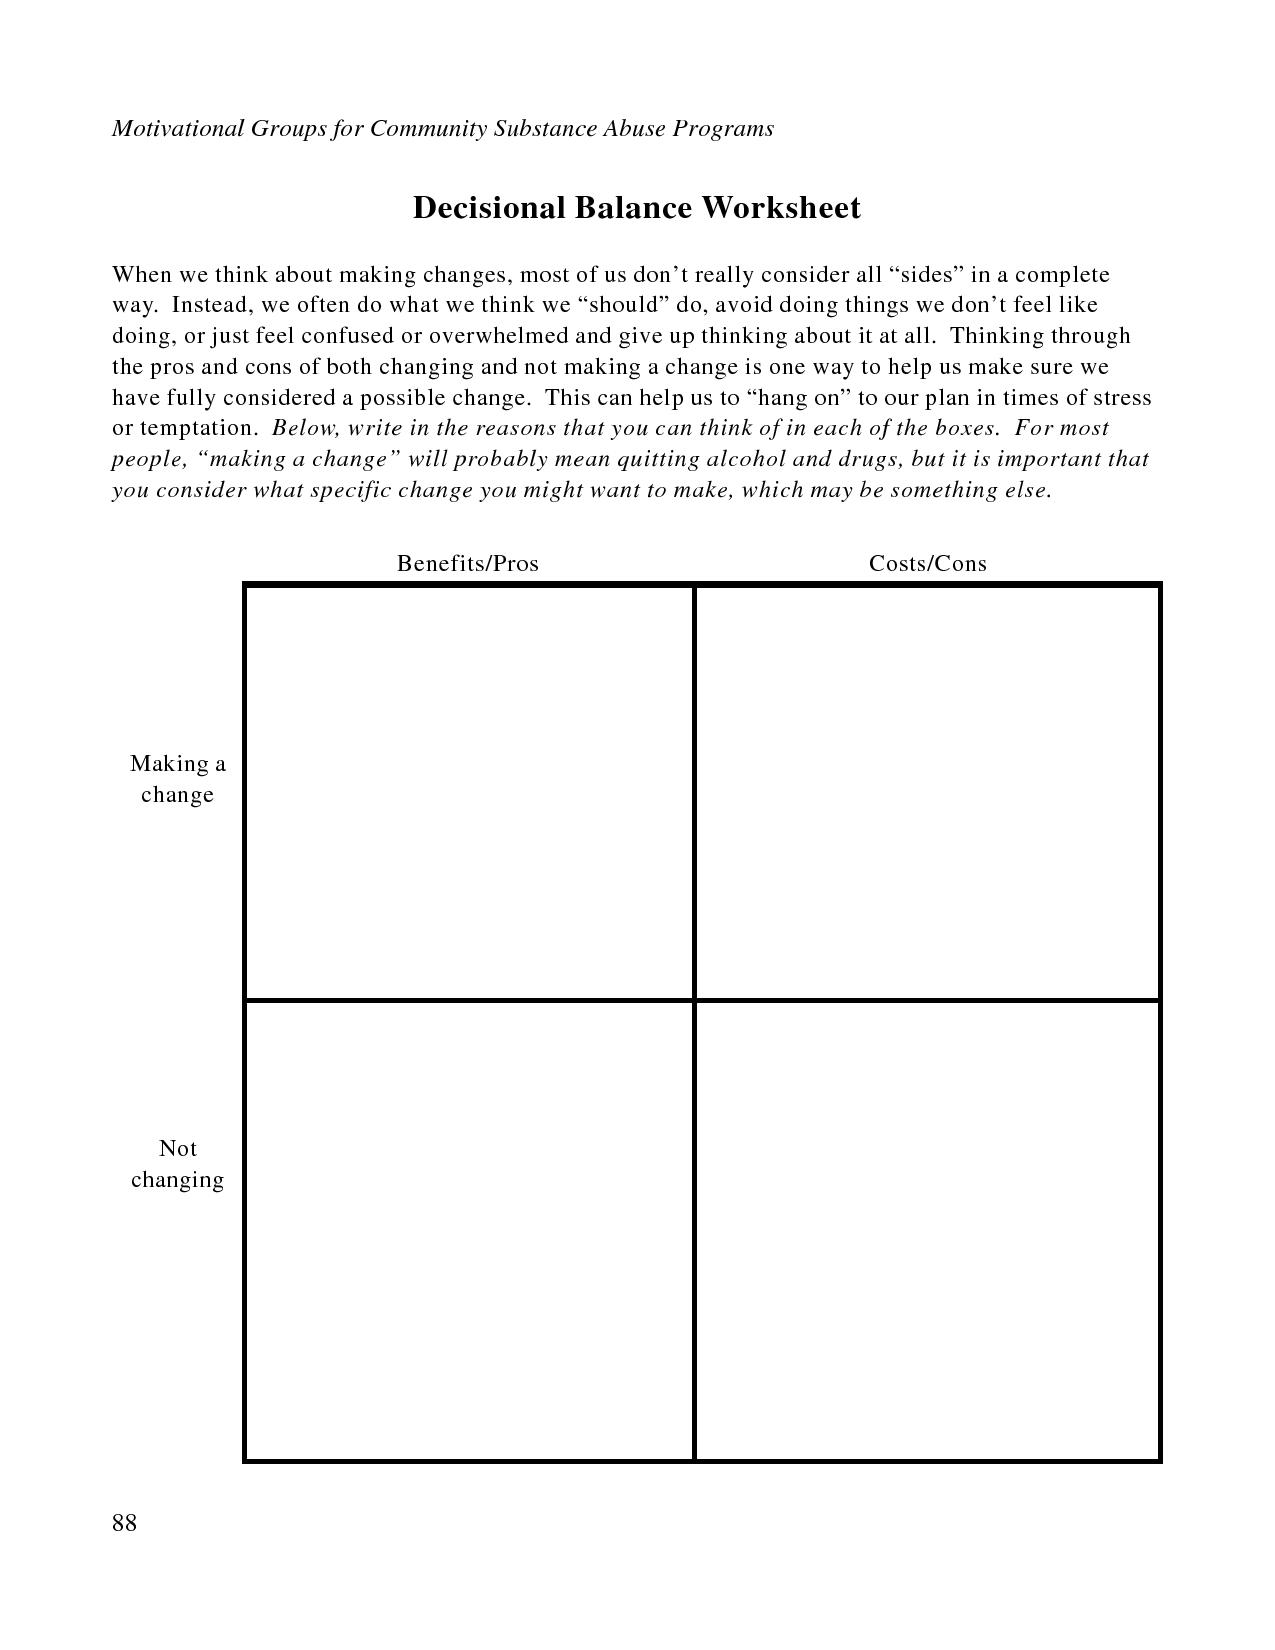 Free Printable Dbt Worksheets | Decisional Balance Worksheet - Pdf - Free Printable Counseling Worksheets